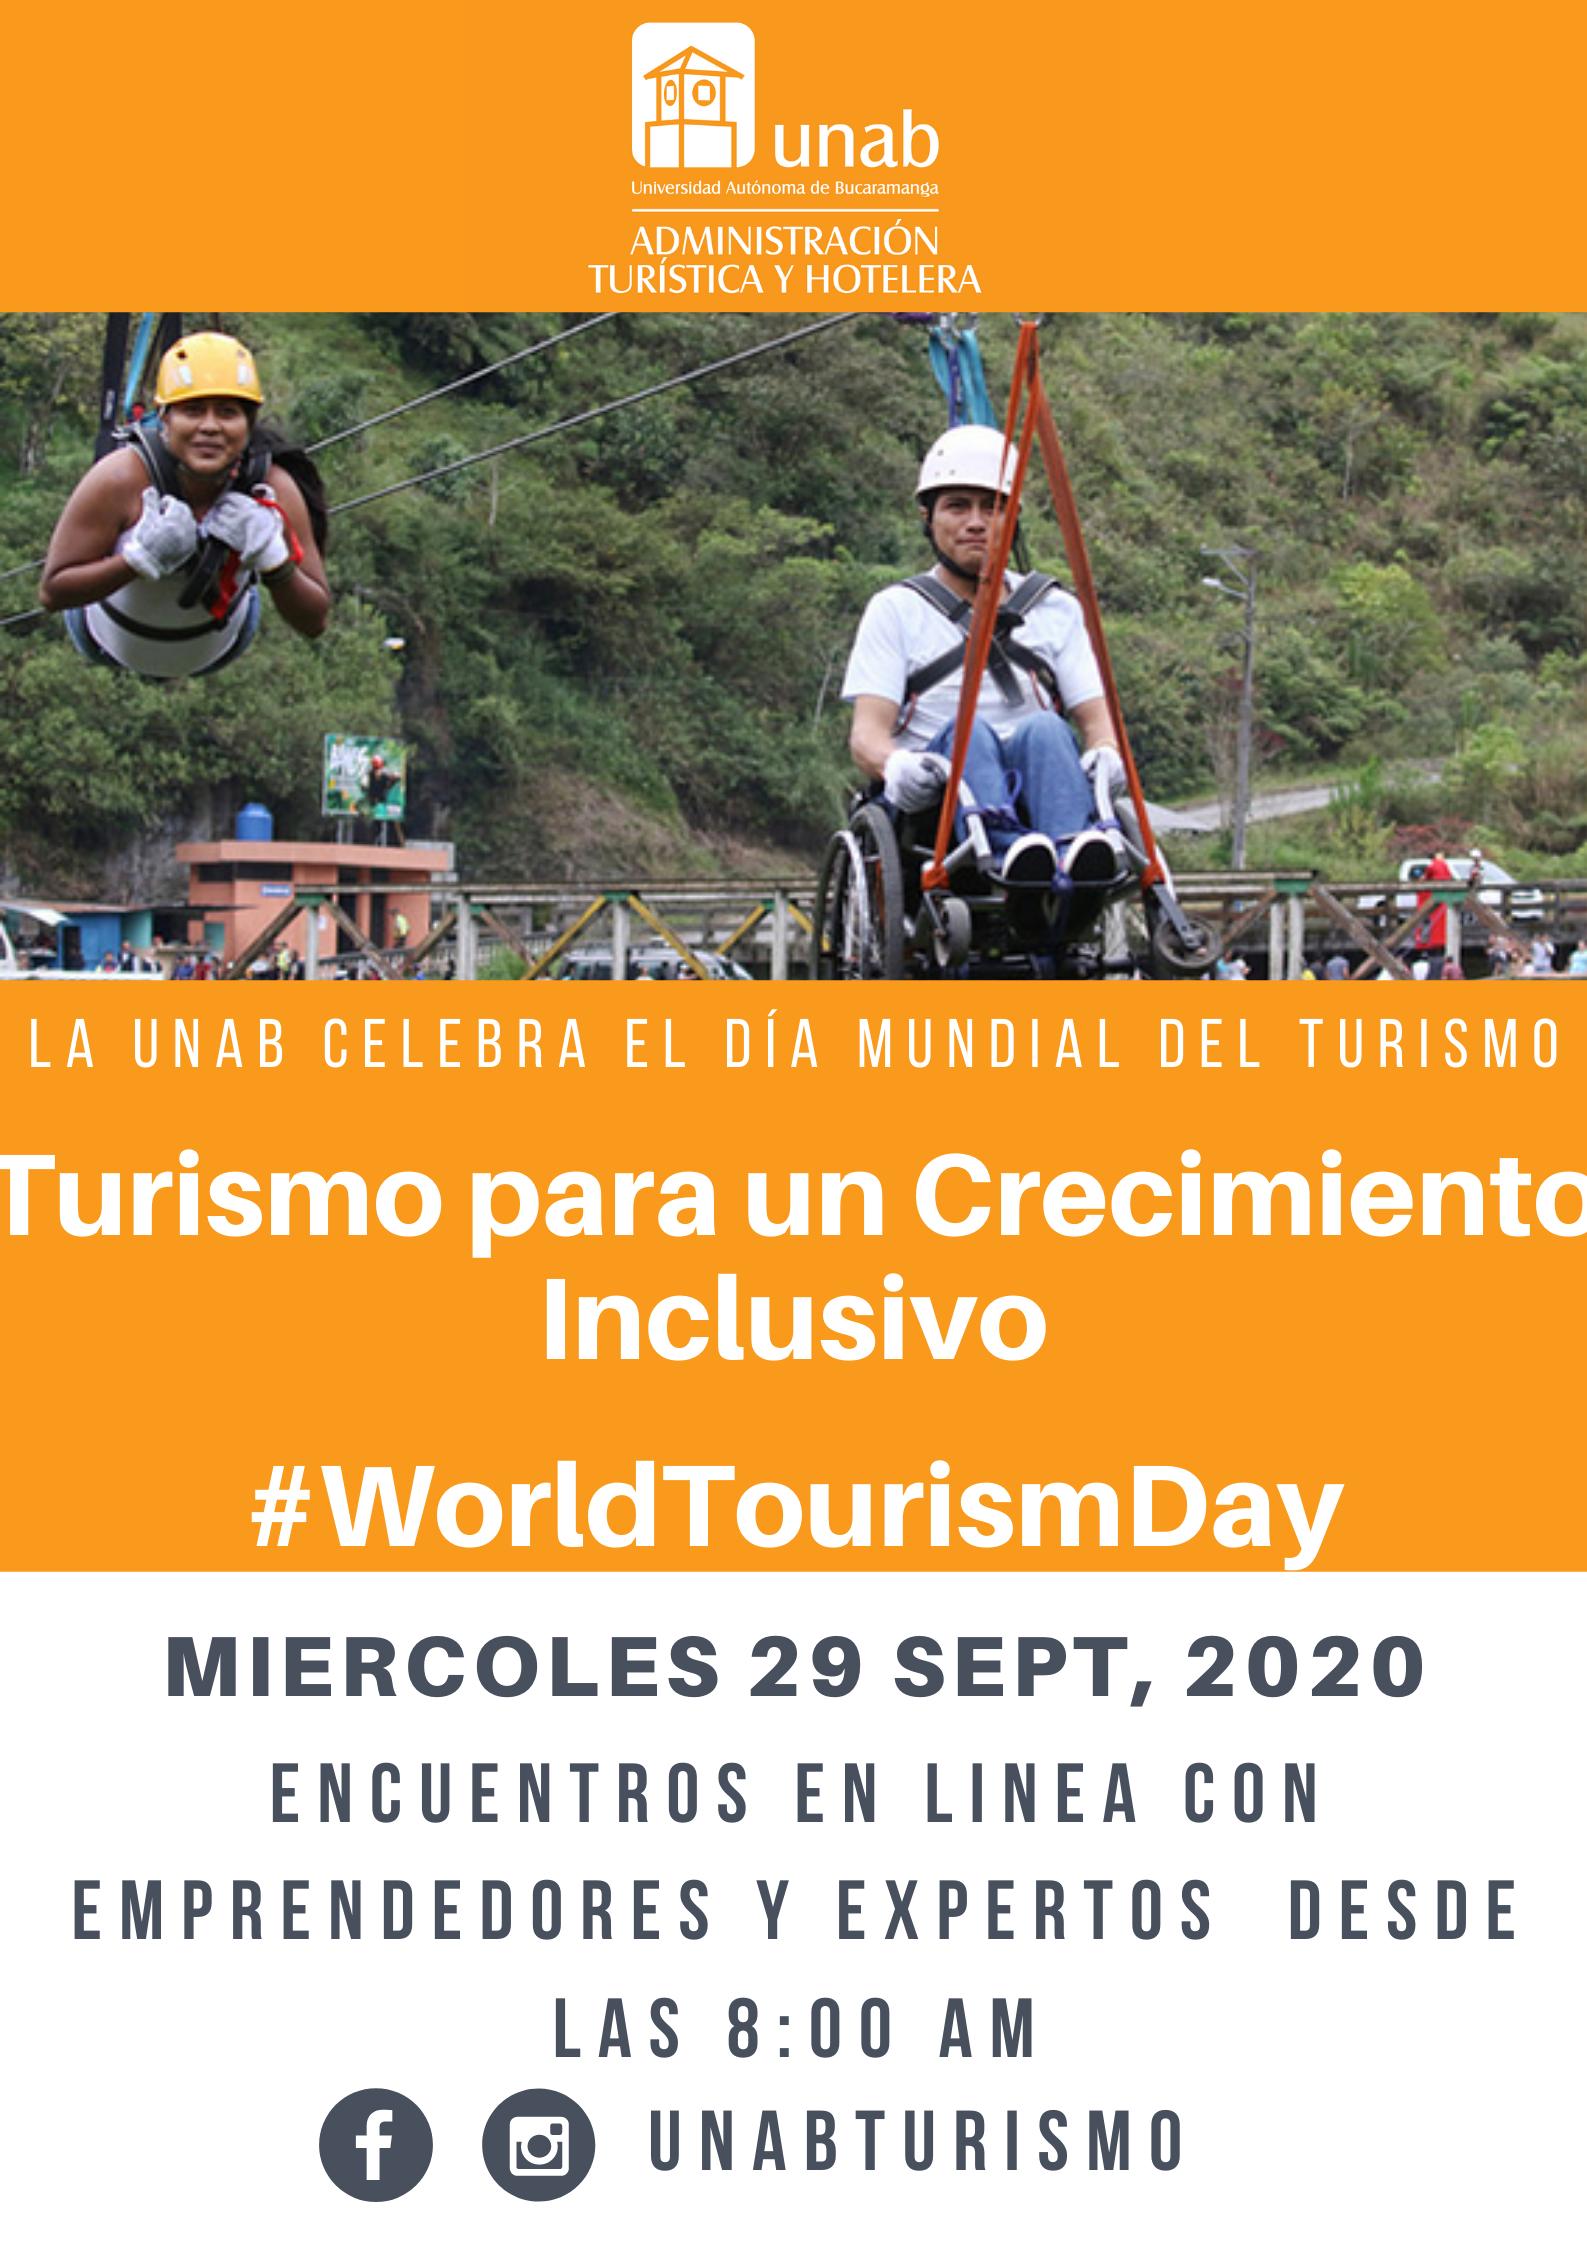 Celebración Dia mundial del Turismo: Universidad Autónoma de Bucaramanga